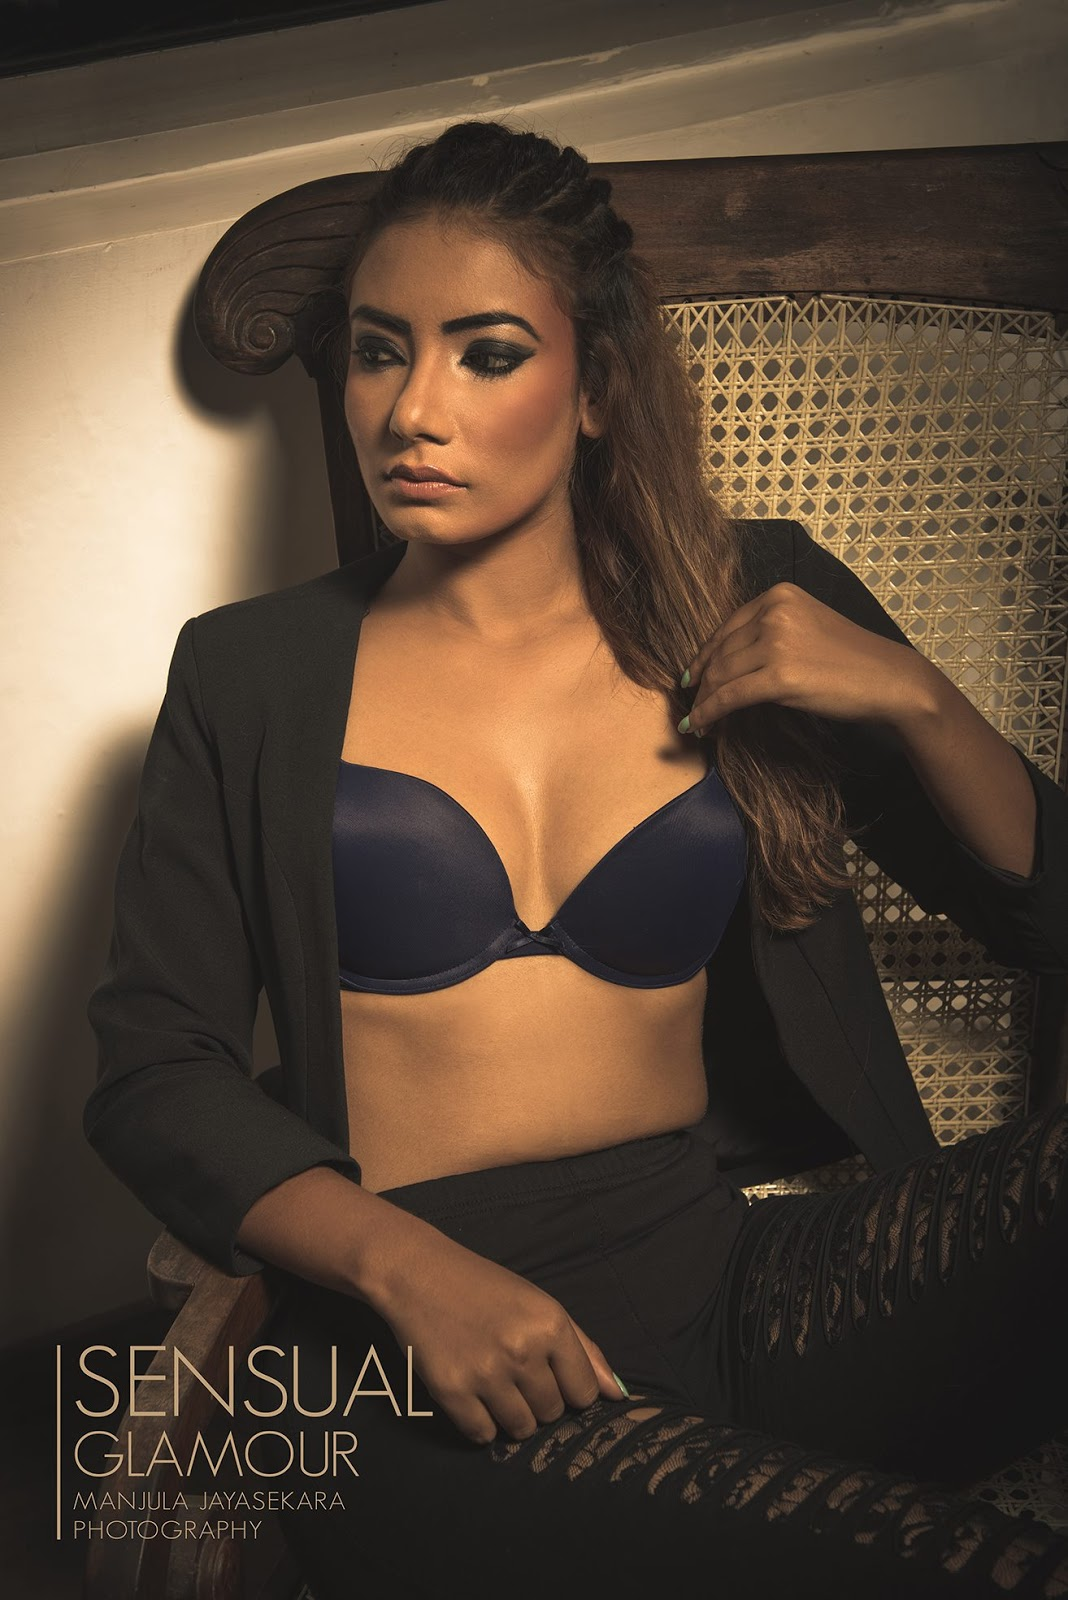 Teena Shanell - Sensual Glamour  Sri Lanka Hot Picture -1479